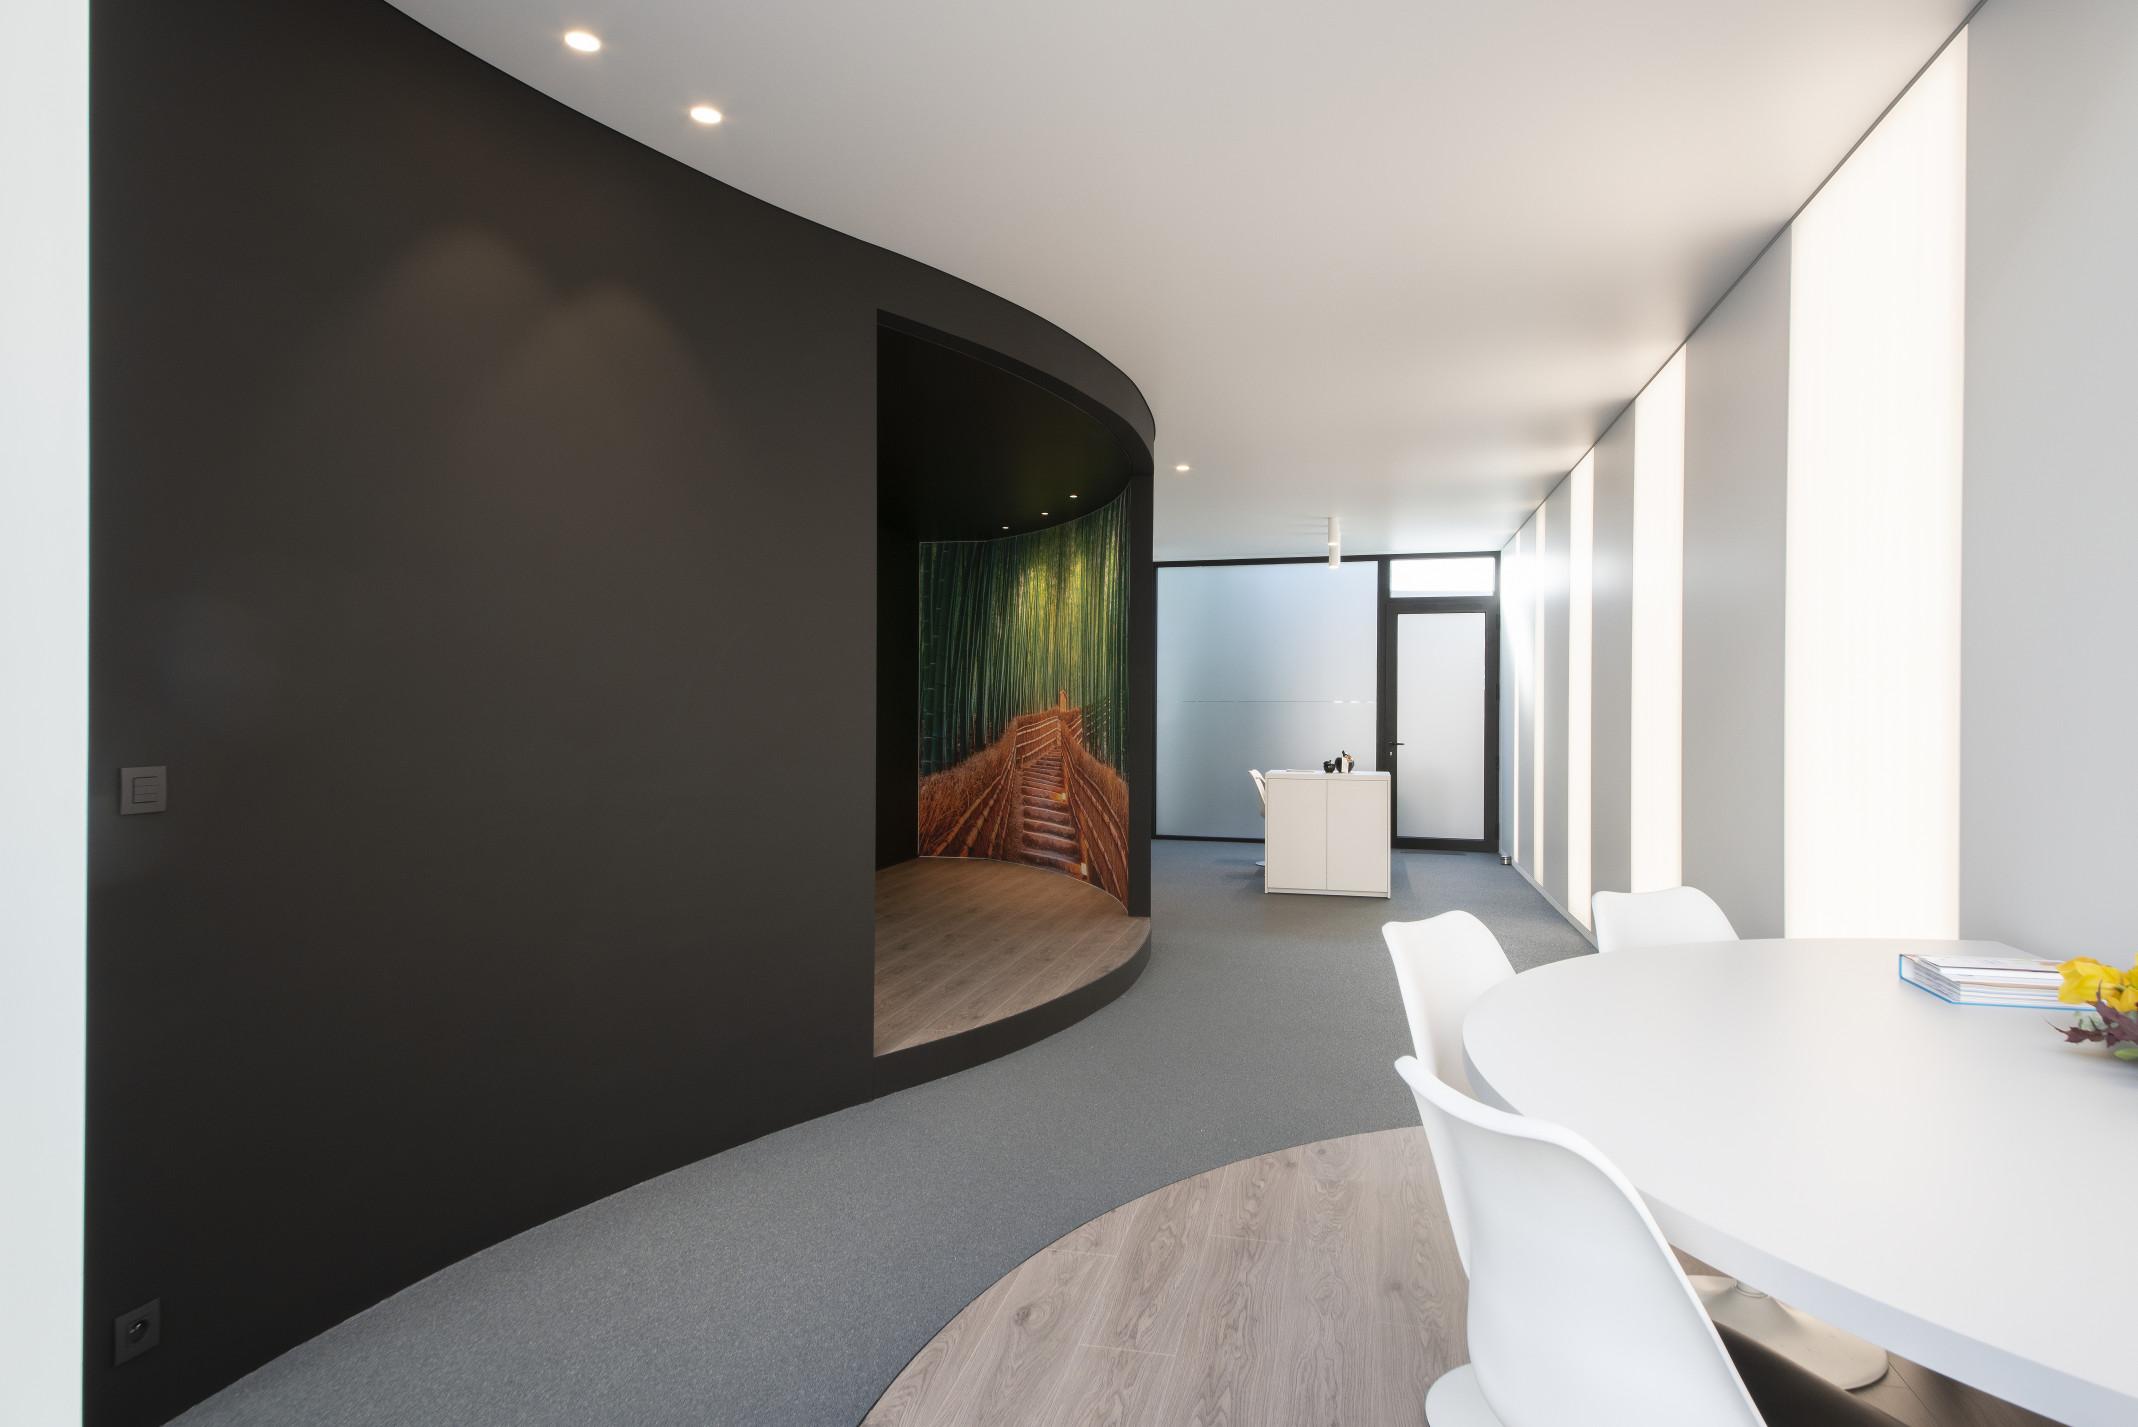 DVSpanplafond-Showroom1018_WAK9006.jpg